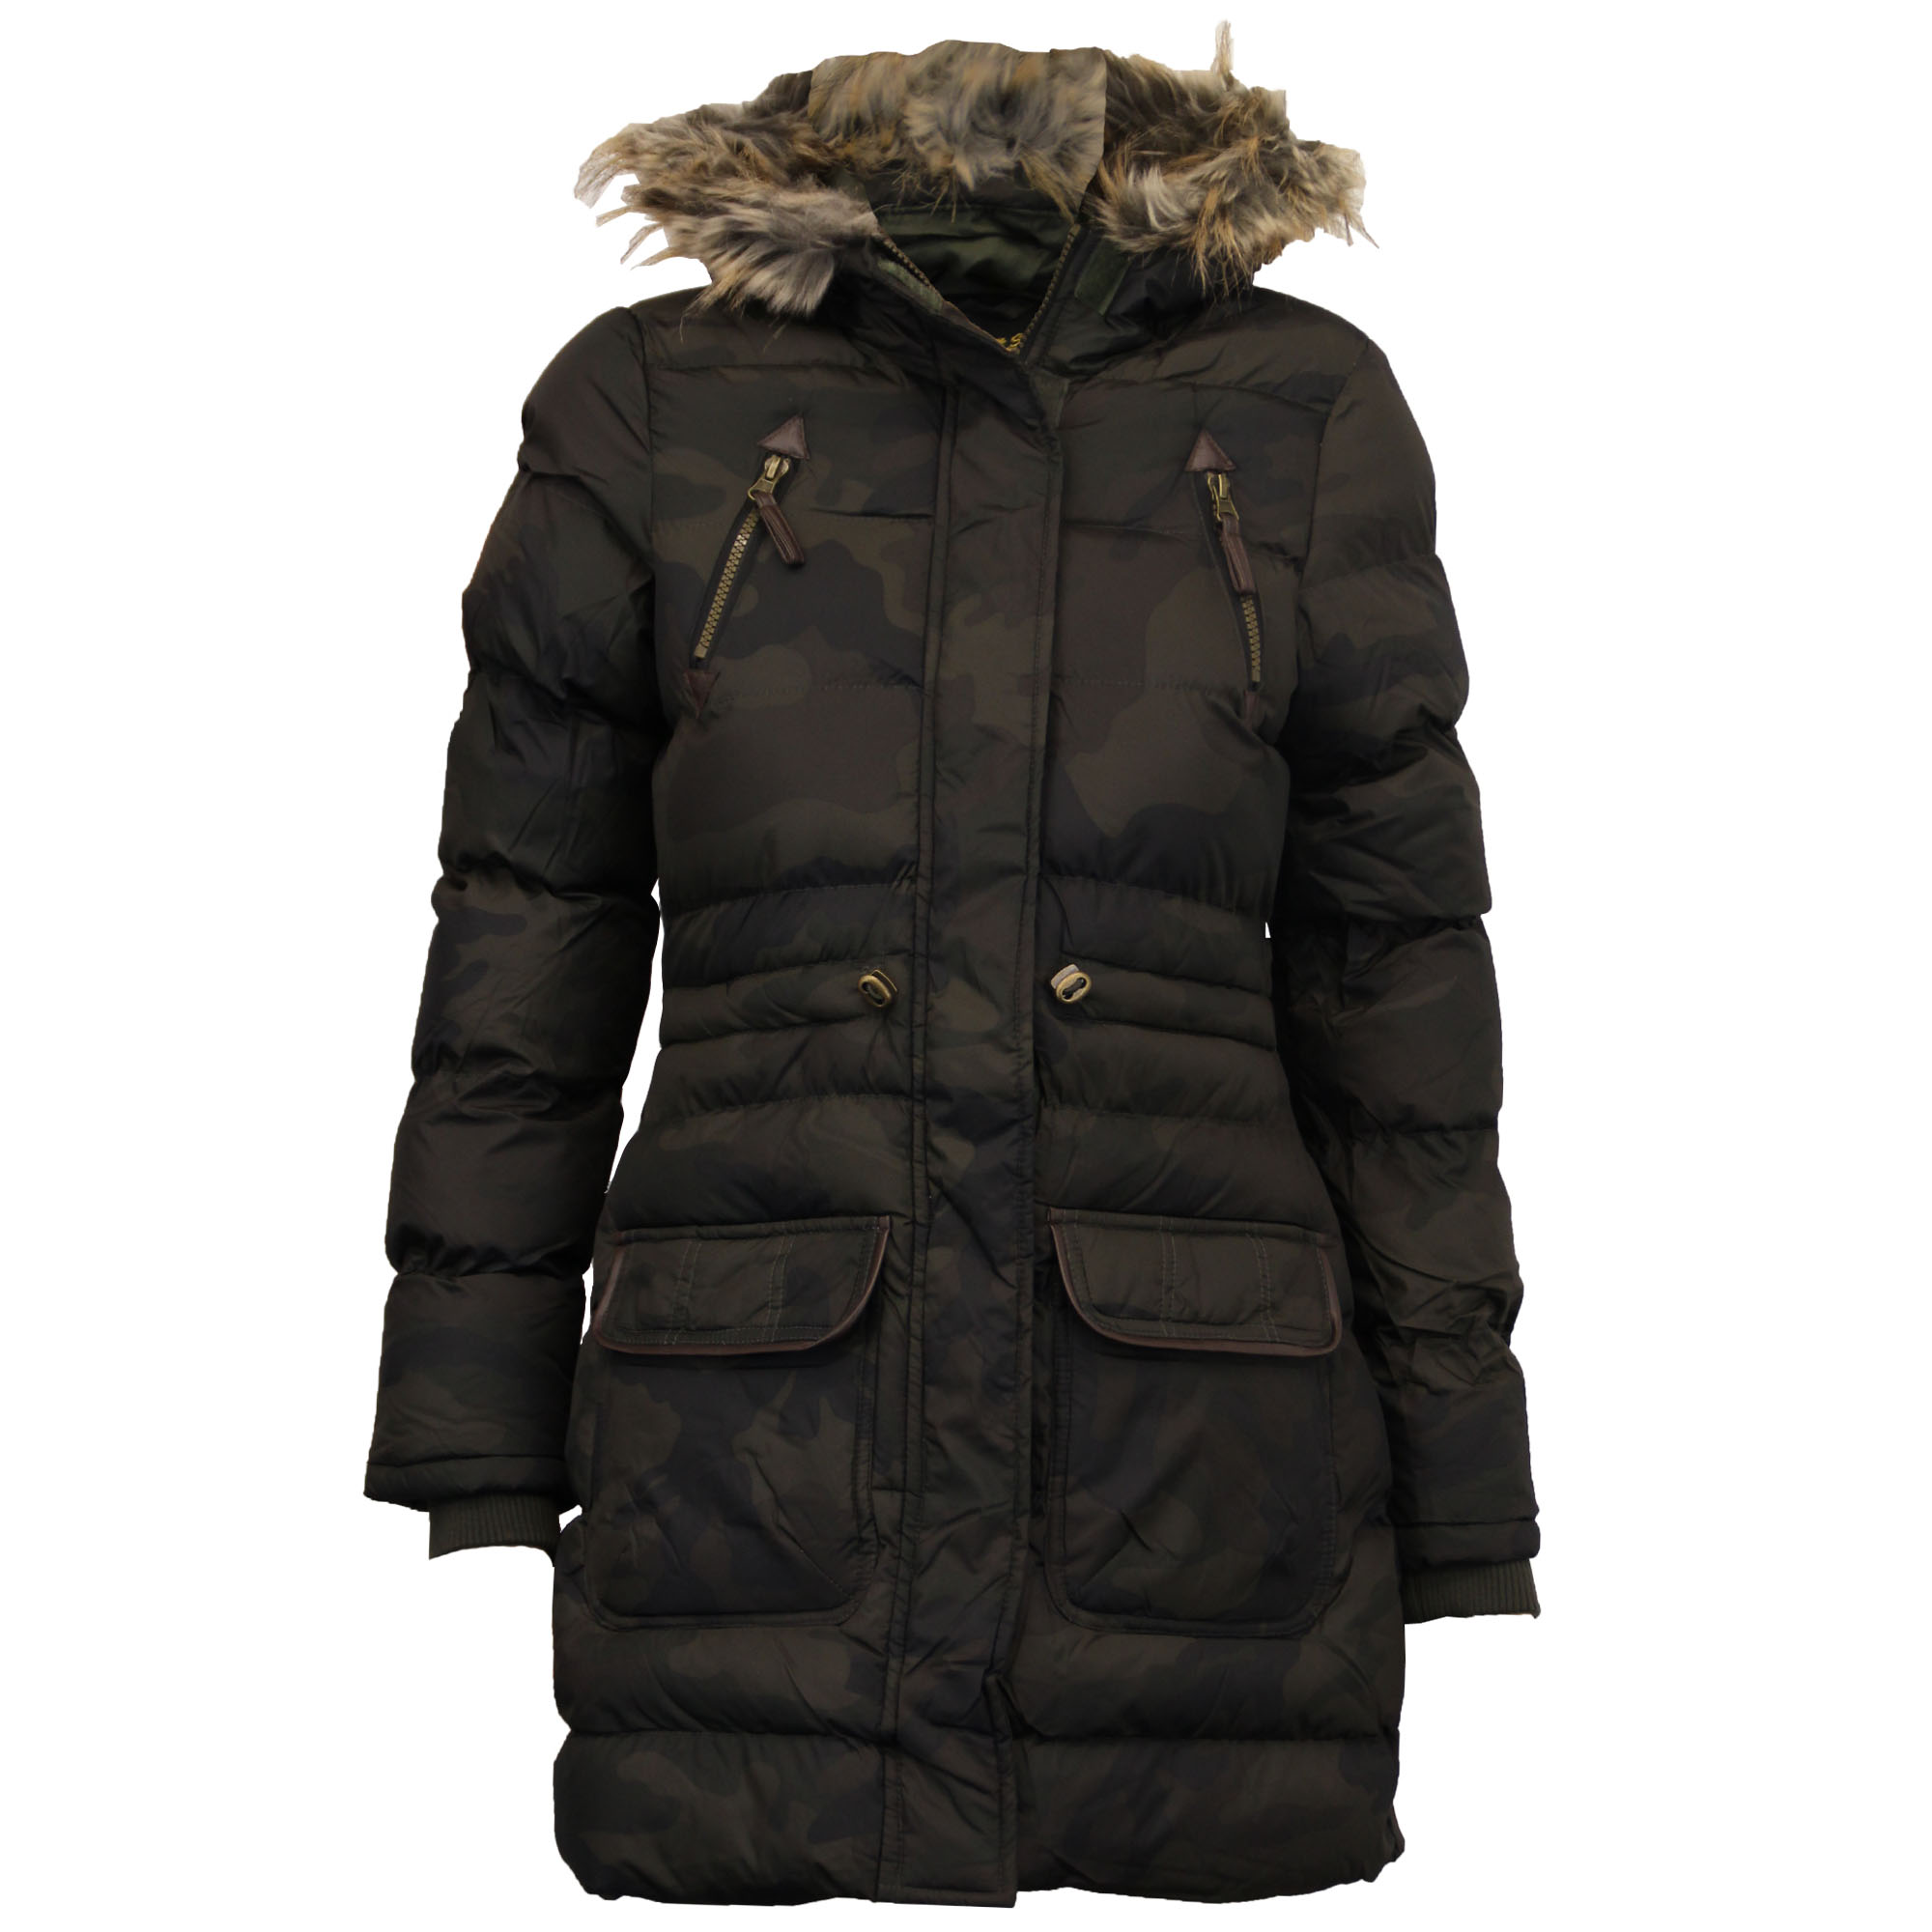 ladies bubble jacket brave soul womens coat camouflage. Black Bedroom Furniture Sets. Home Design Ideas